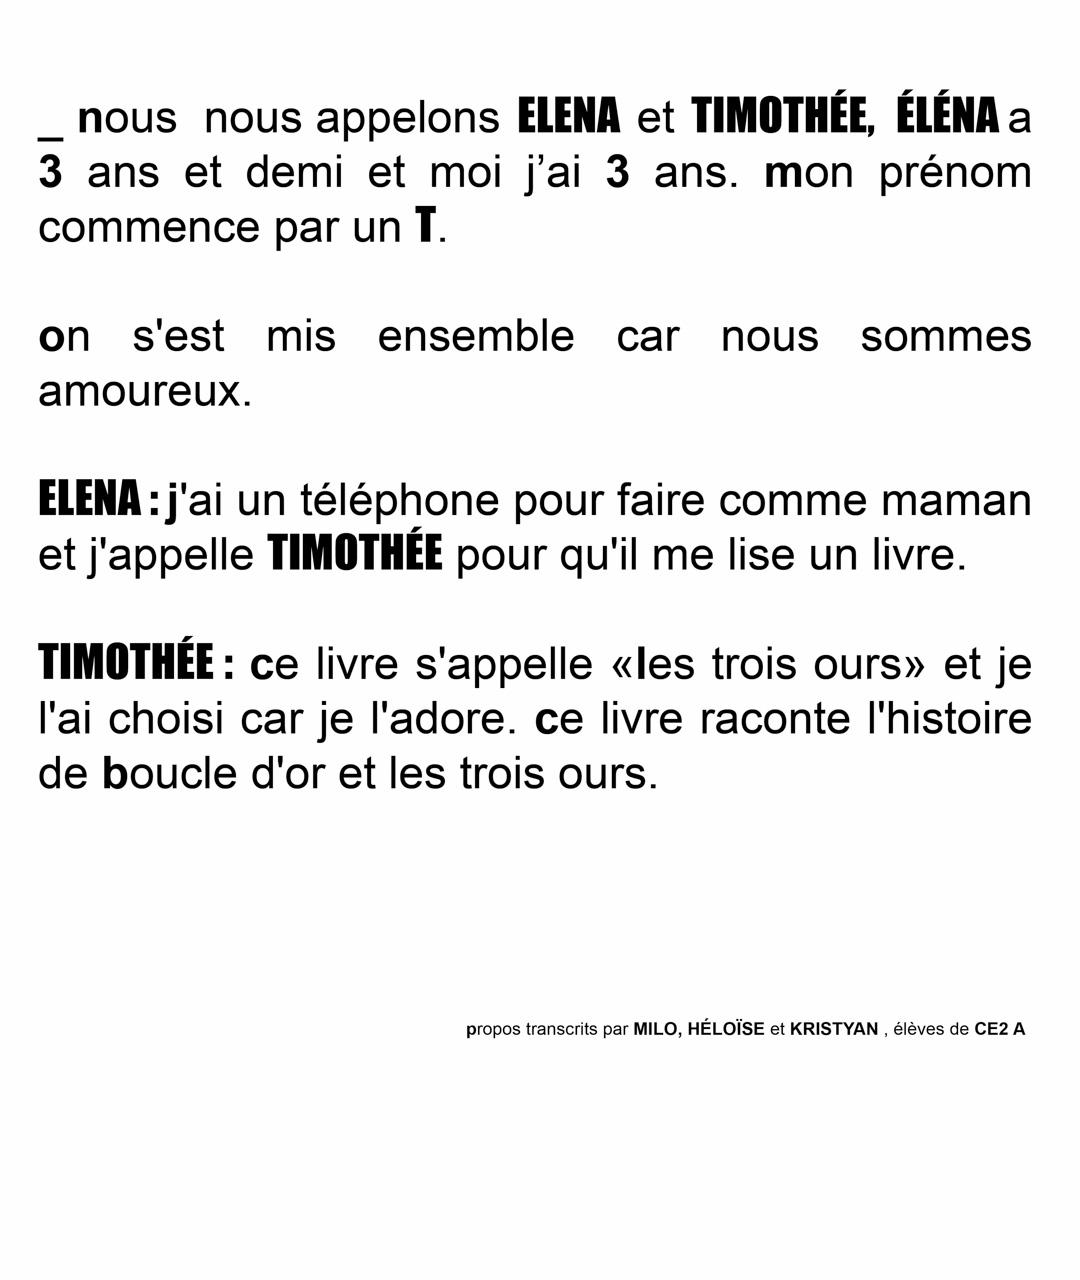 LM_048_2013_elena_timothee_004